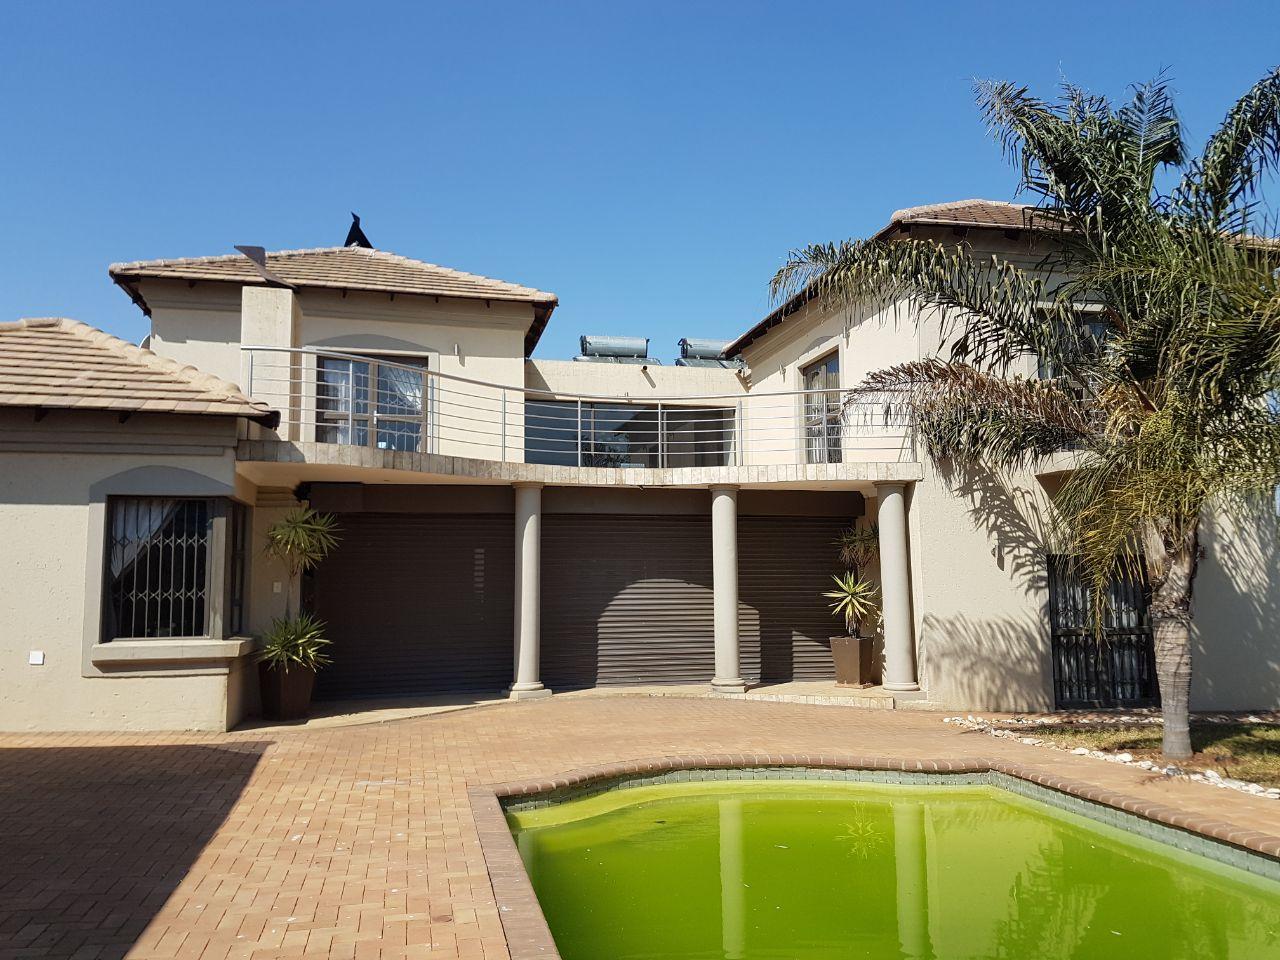 5 Bedroom House for sale in Eldoraigne ENT0074650 : photo#0